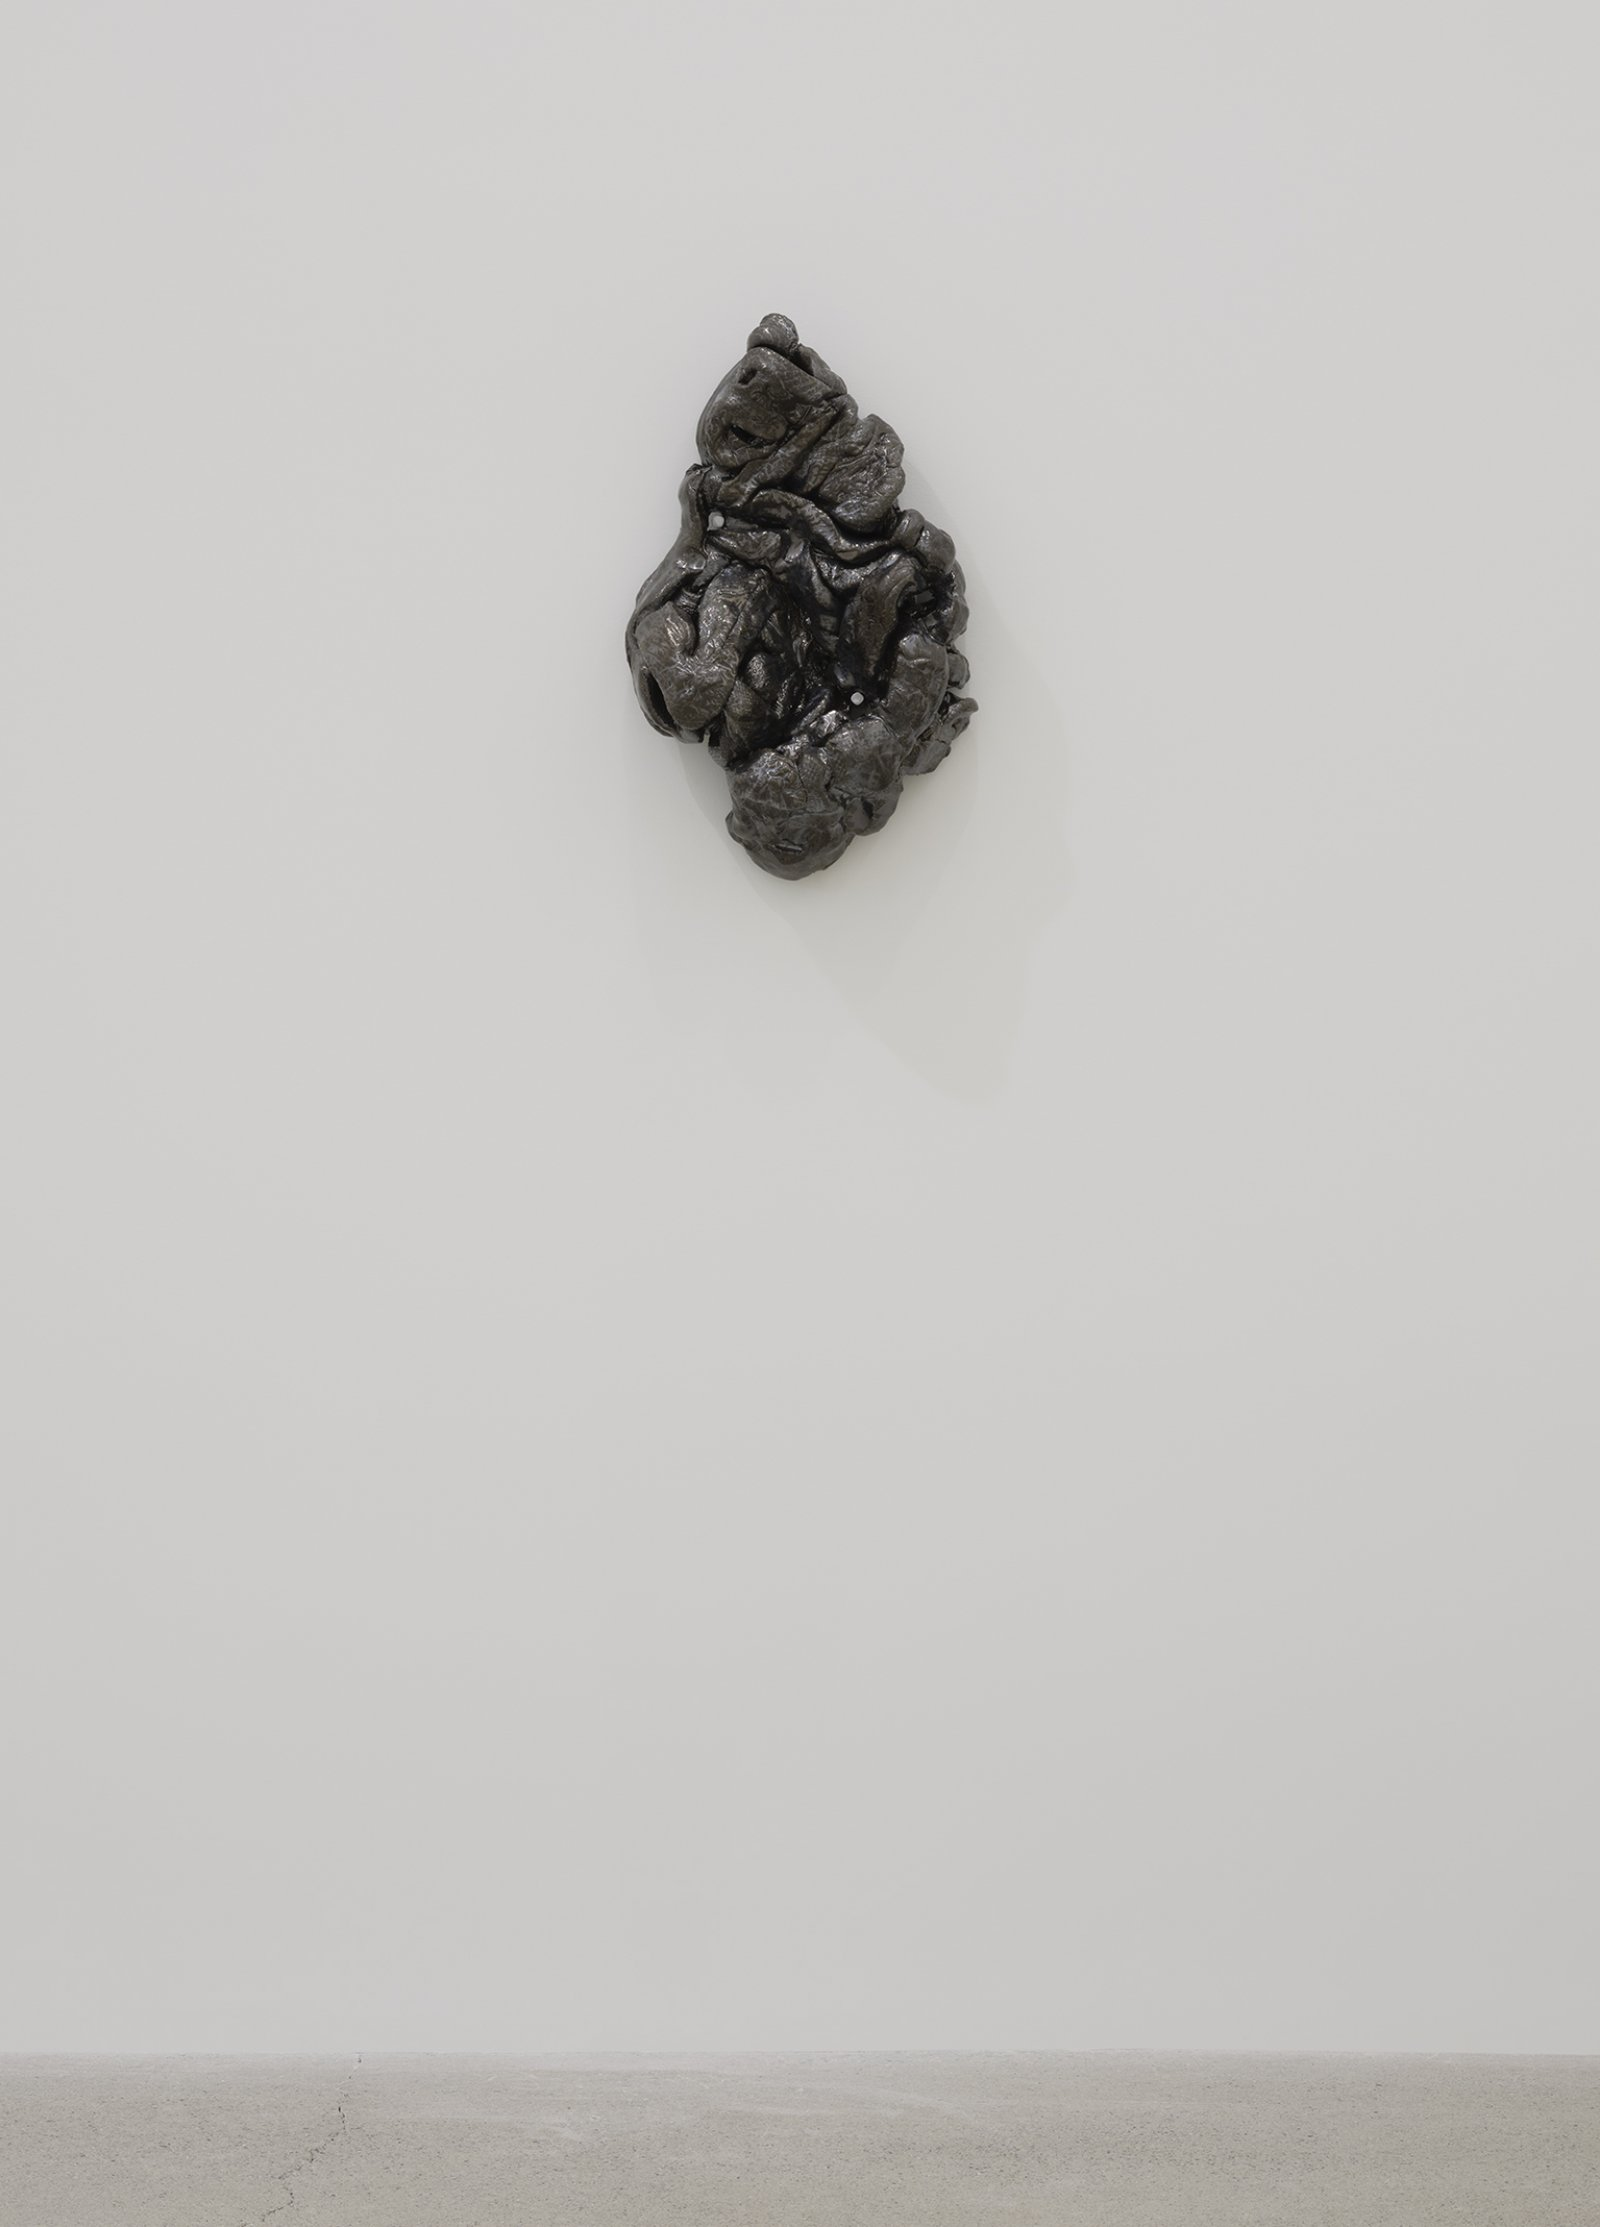 Rochelle Goldberg, Composite Contact I, 2019, glazed ceramic, nails, 17 x 11 x 6 in. (43 x 28 x 14 cm) by Rochelle Goldberg